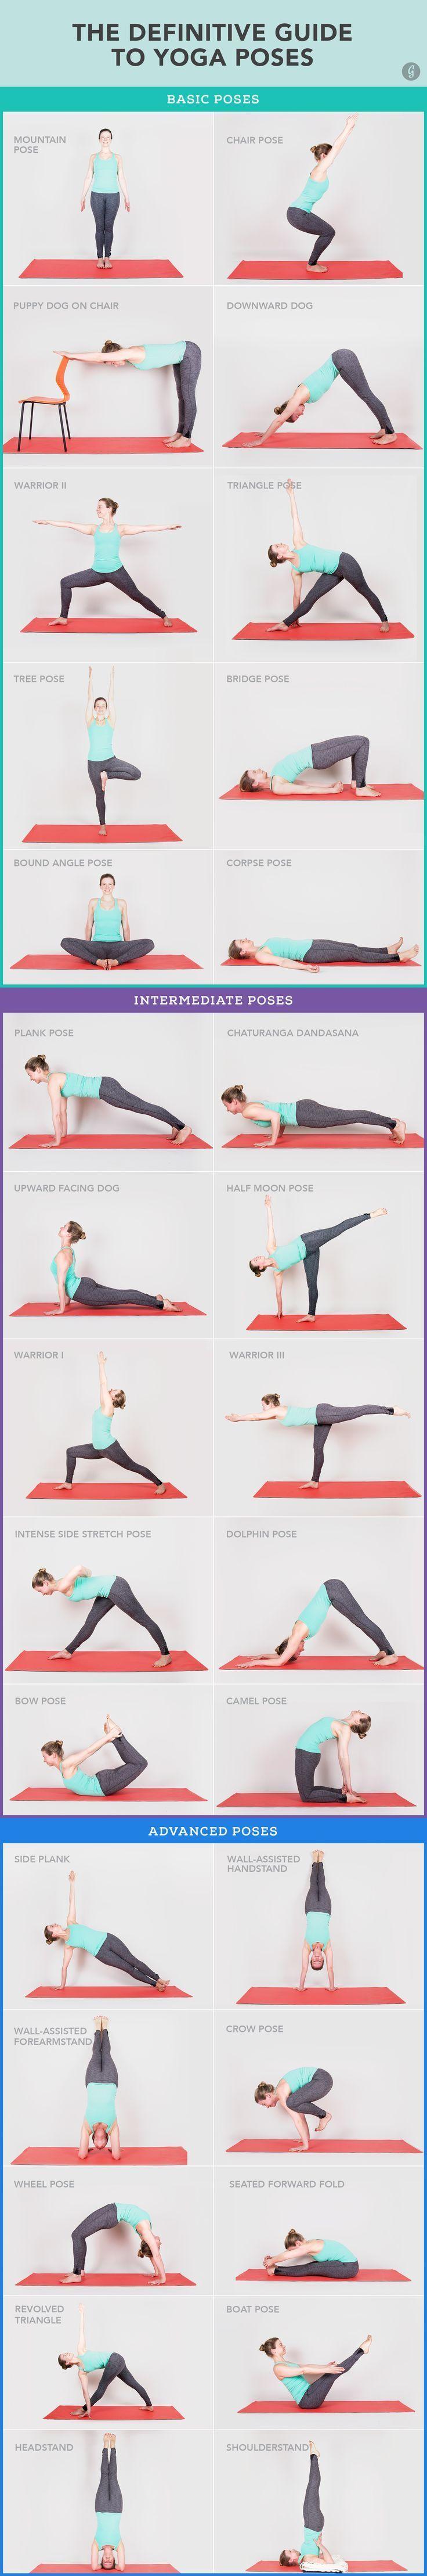 30 Yoga Poses You Really Need To Know #fitness #yoga #health